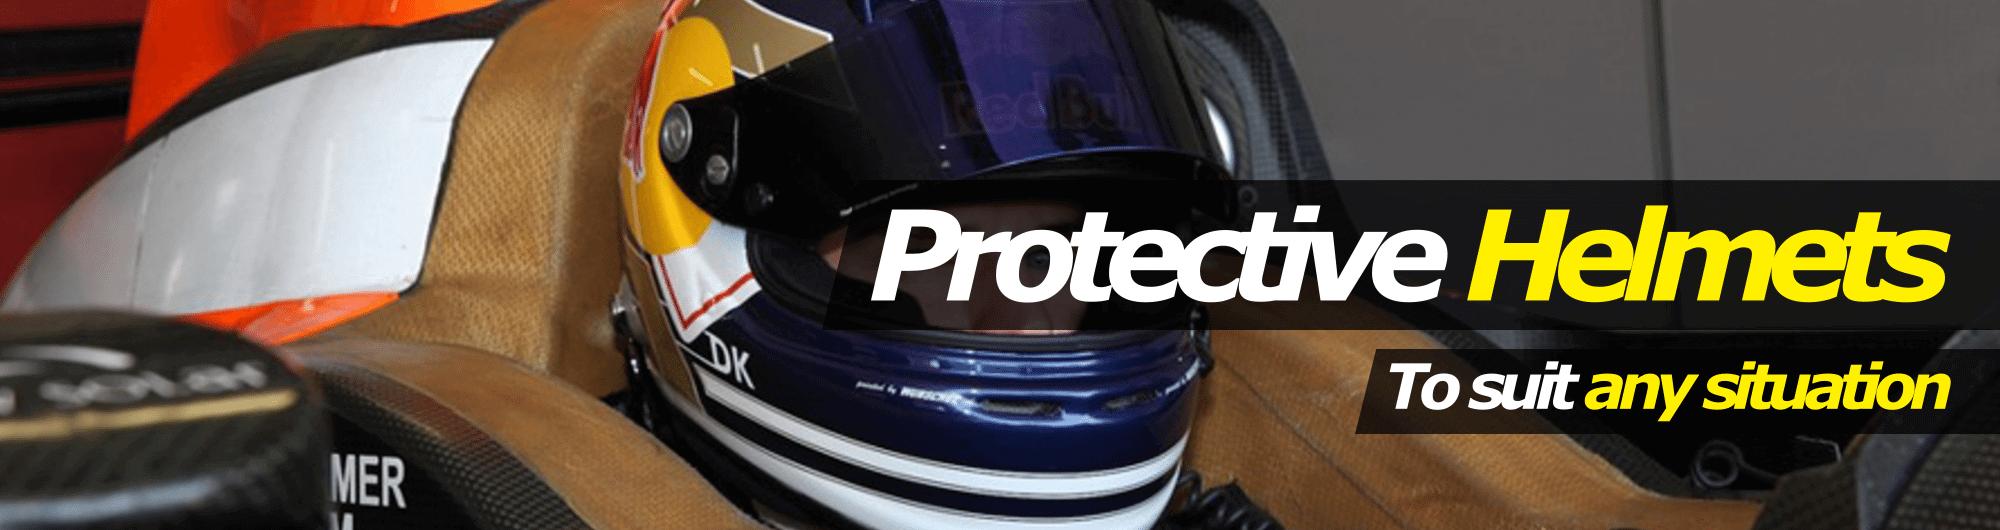 Protective Helmets Slider